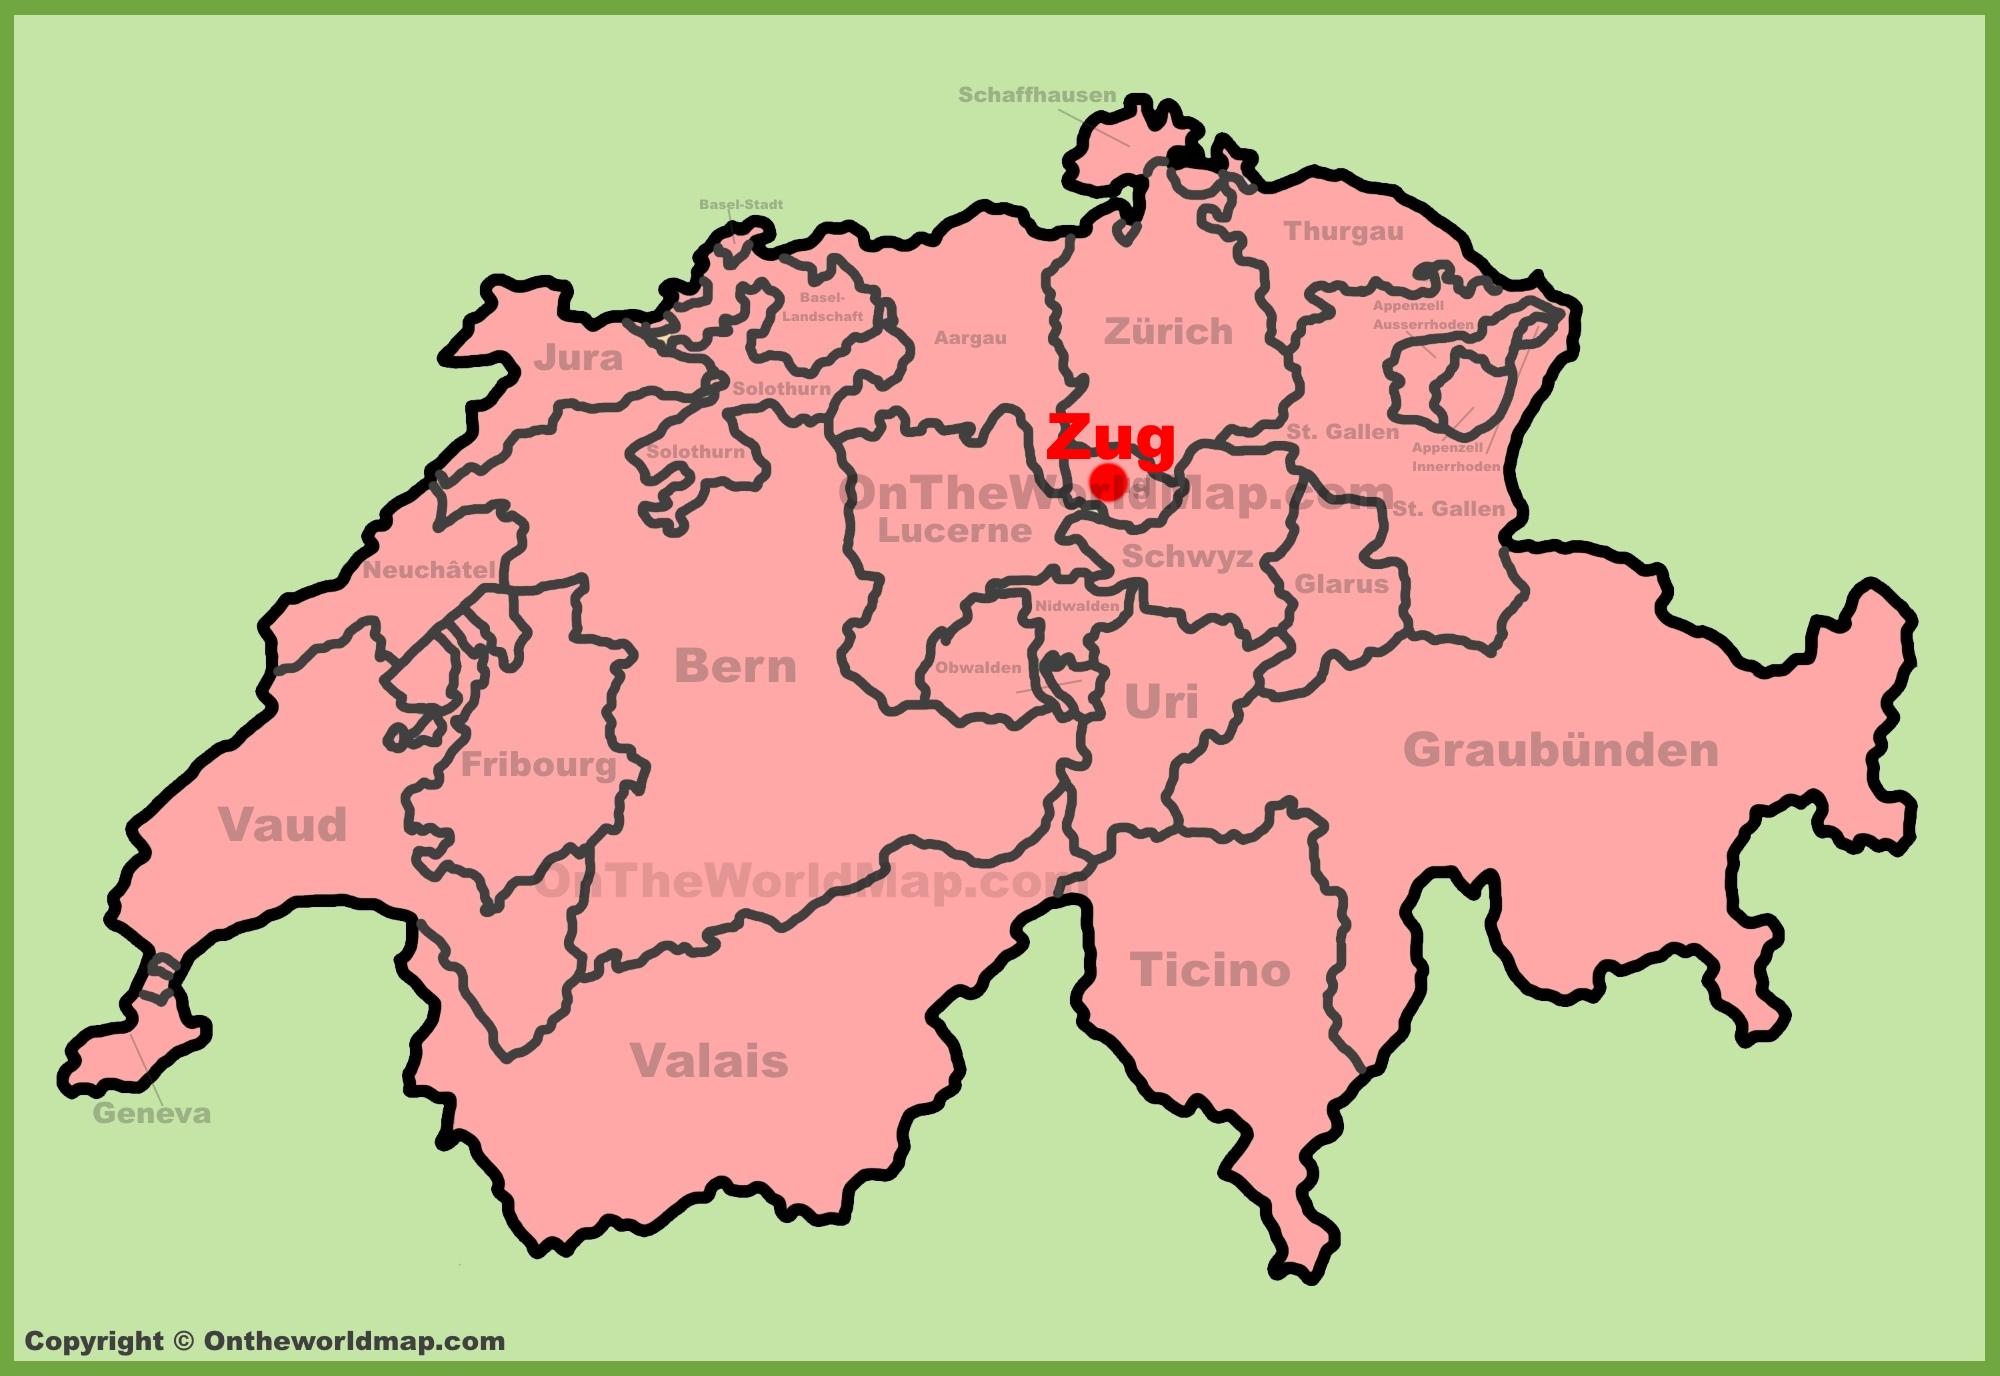 Zug location on the Switzerland map